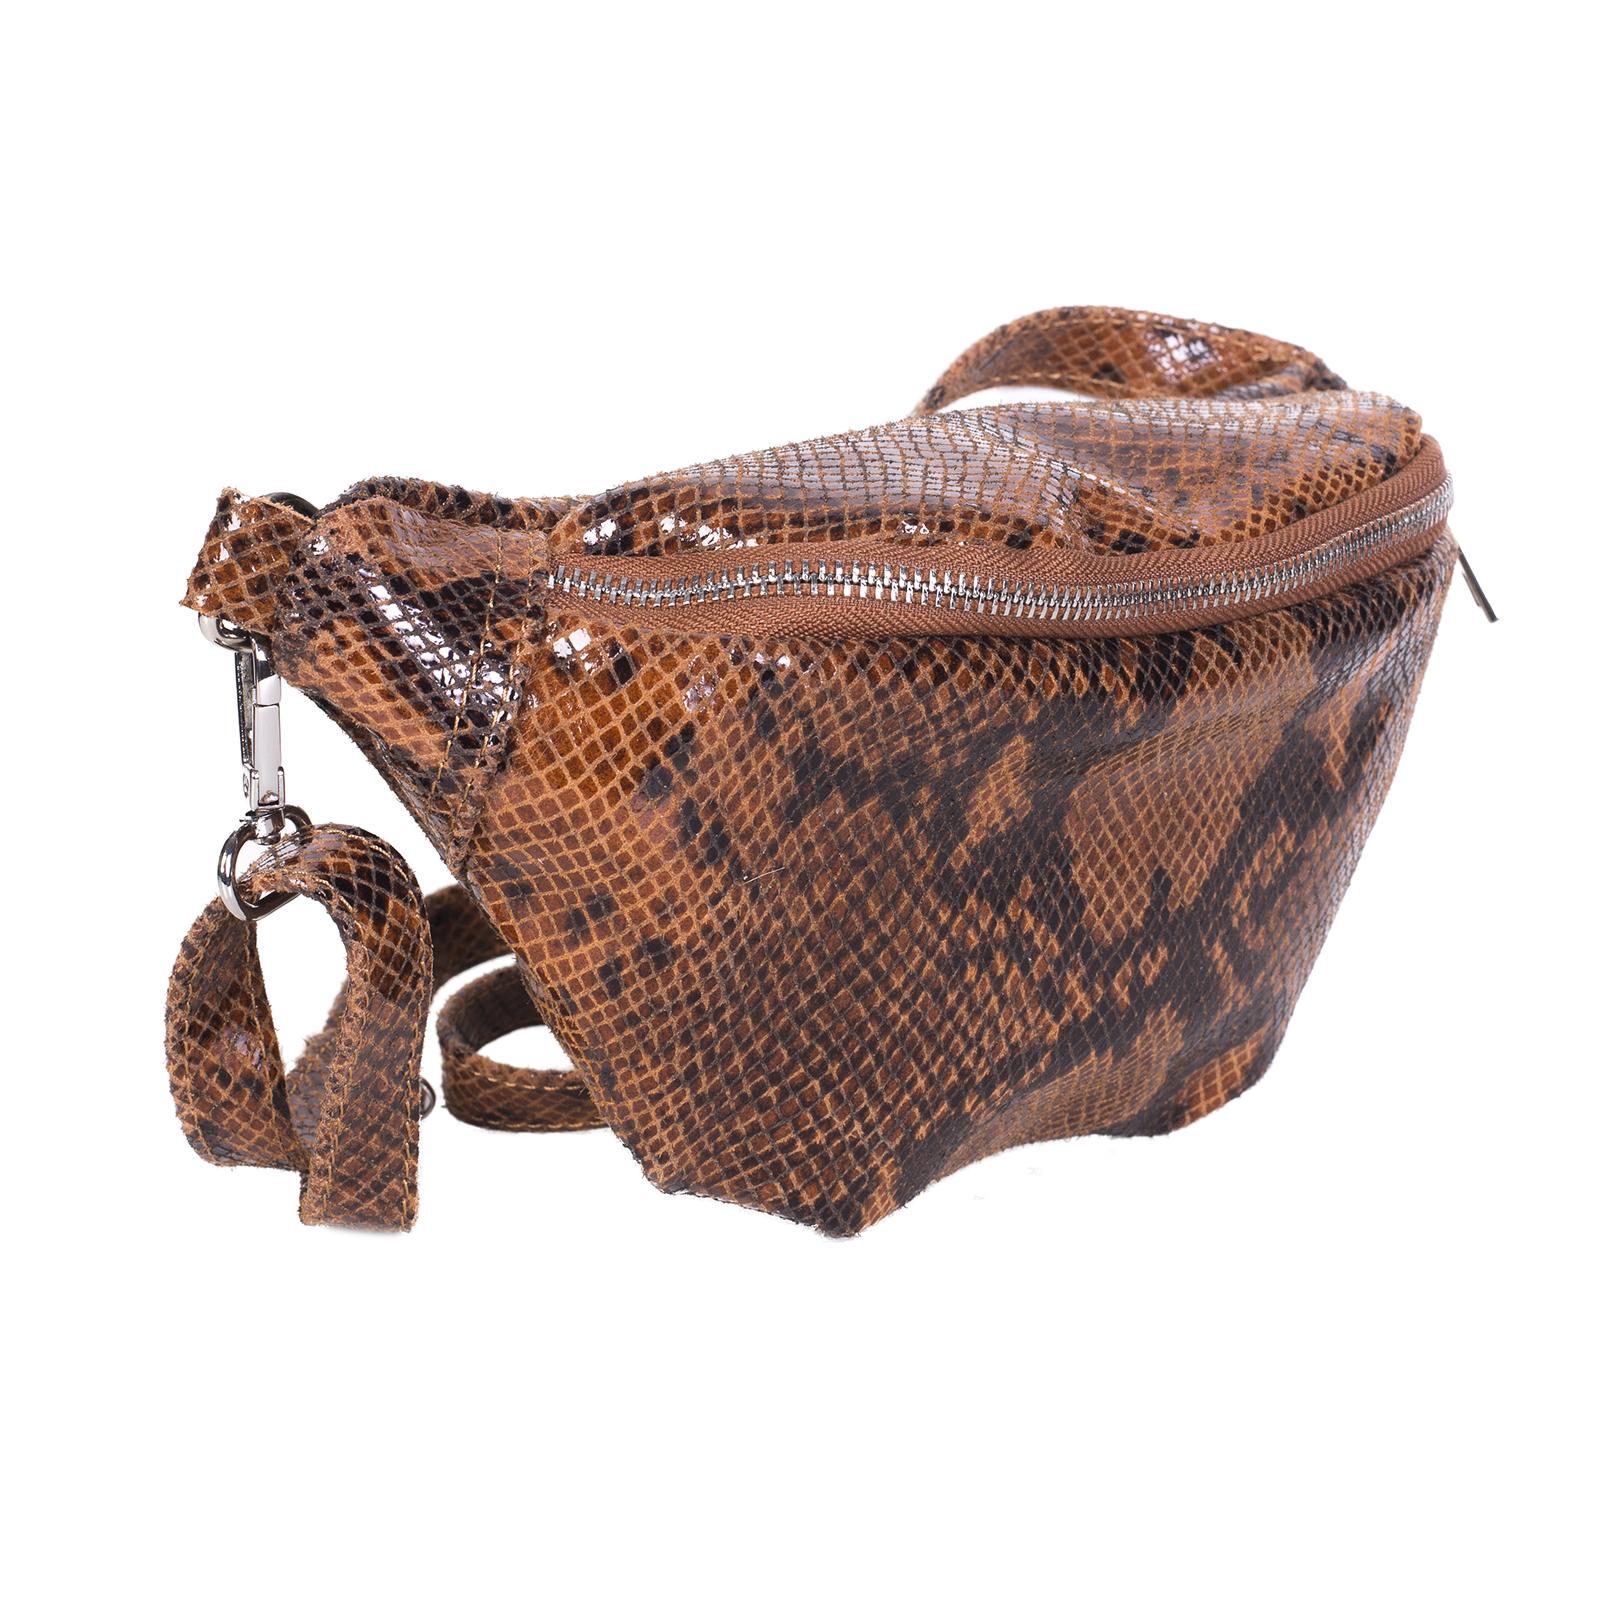 Fanny pack, UNO, Lauryn (коричневый питон)